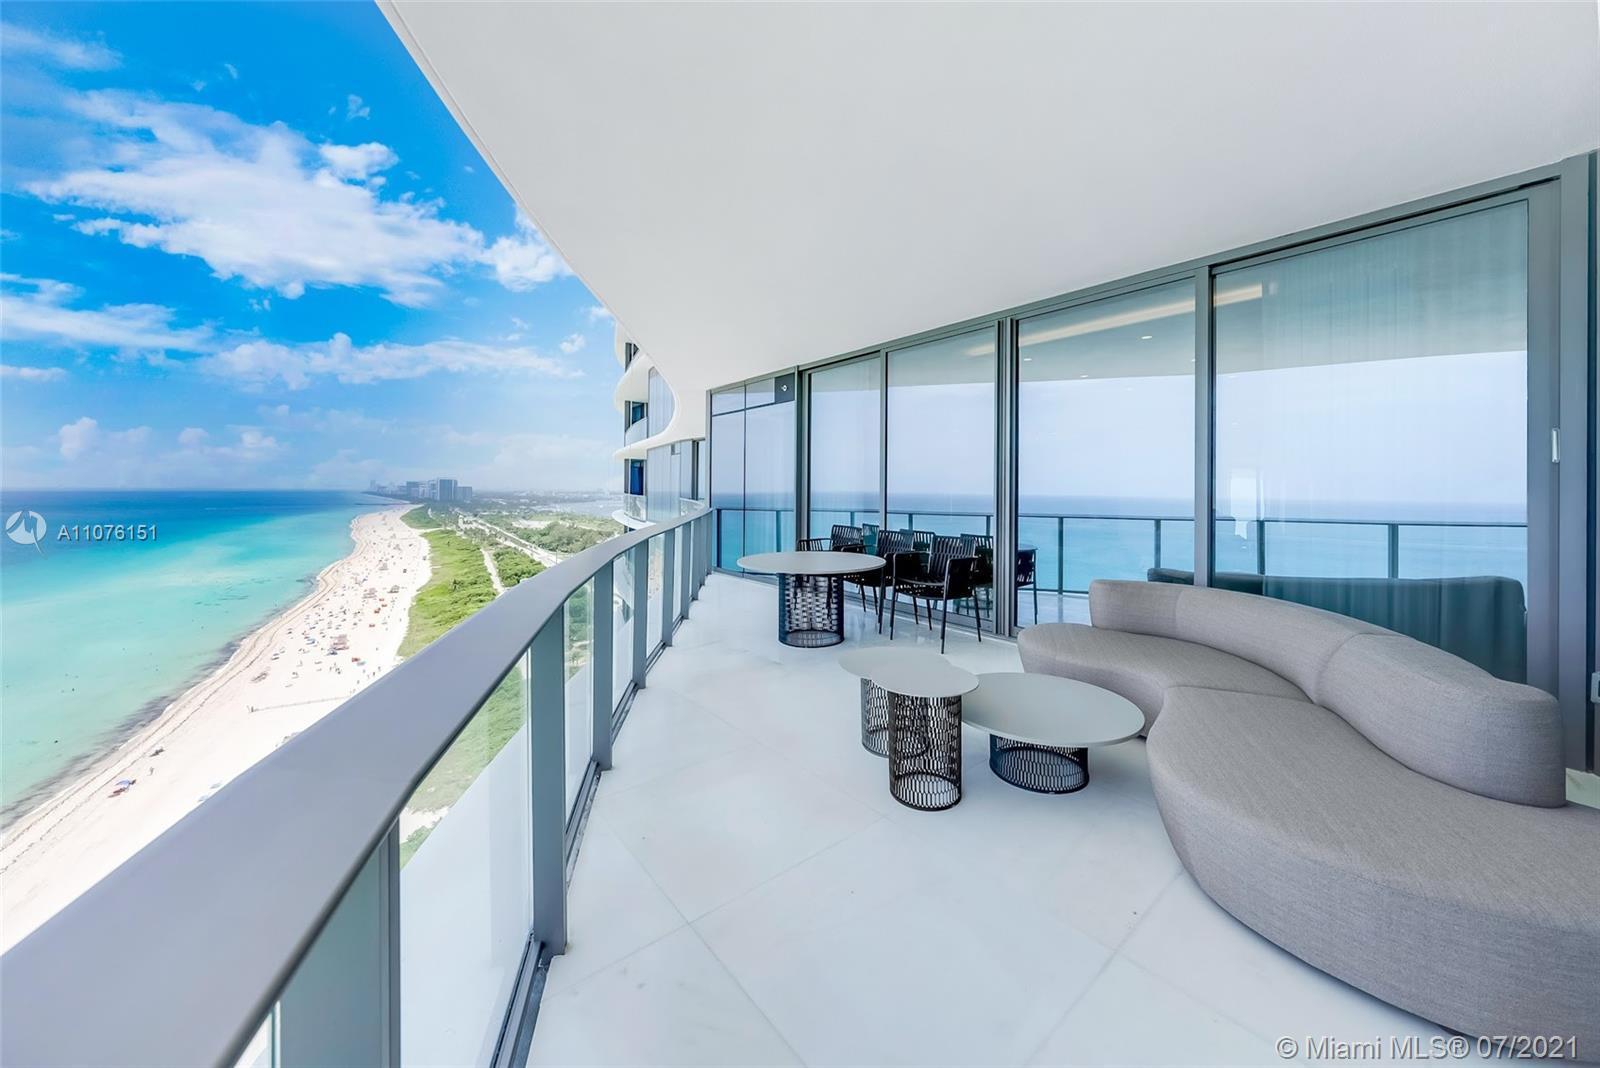 Turn-key unit at The Ritz Carlton Sunny Isles Beach! 3BD + 3.5BA + family room, 2,475 sf. flow-thru